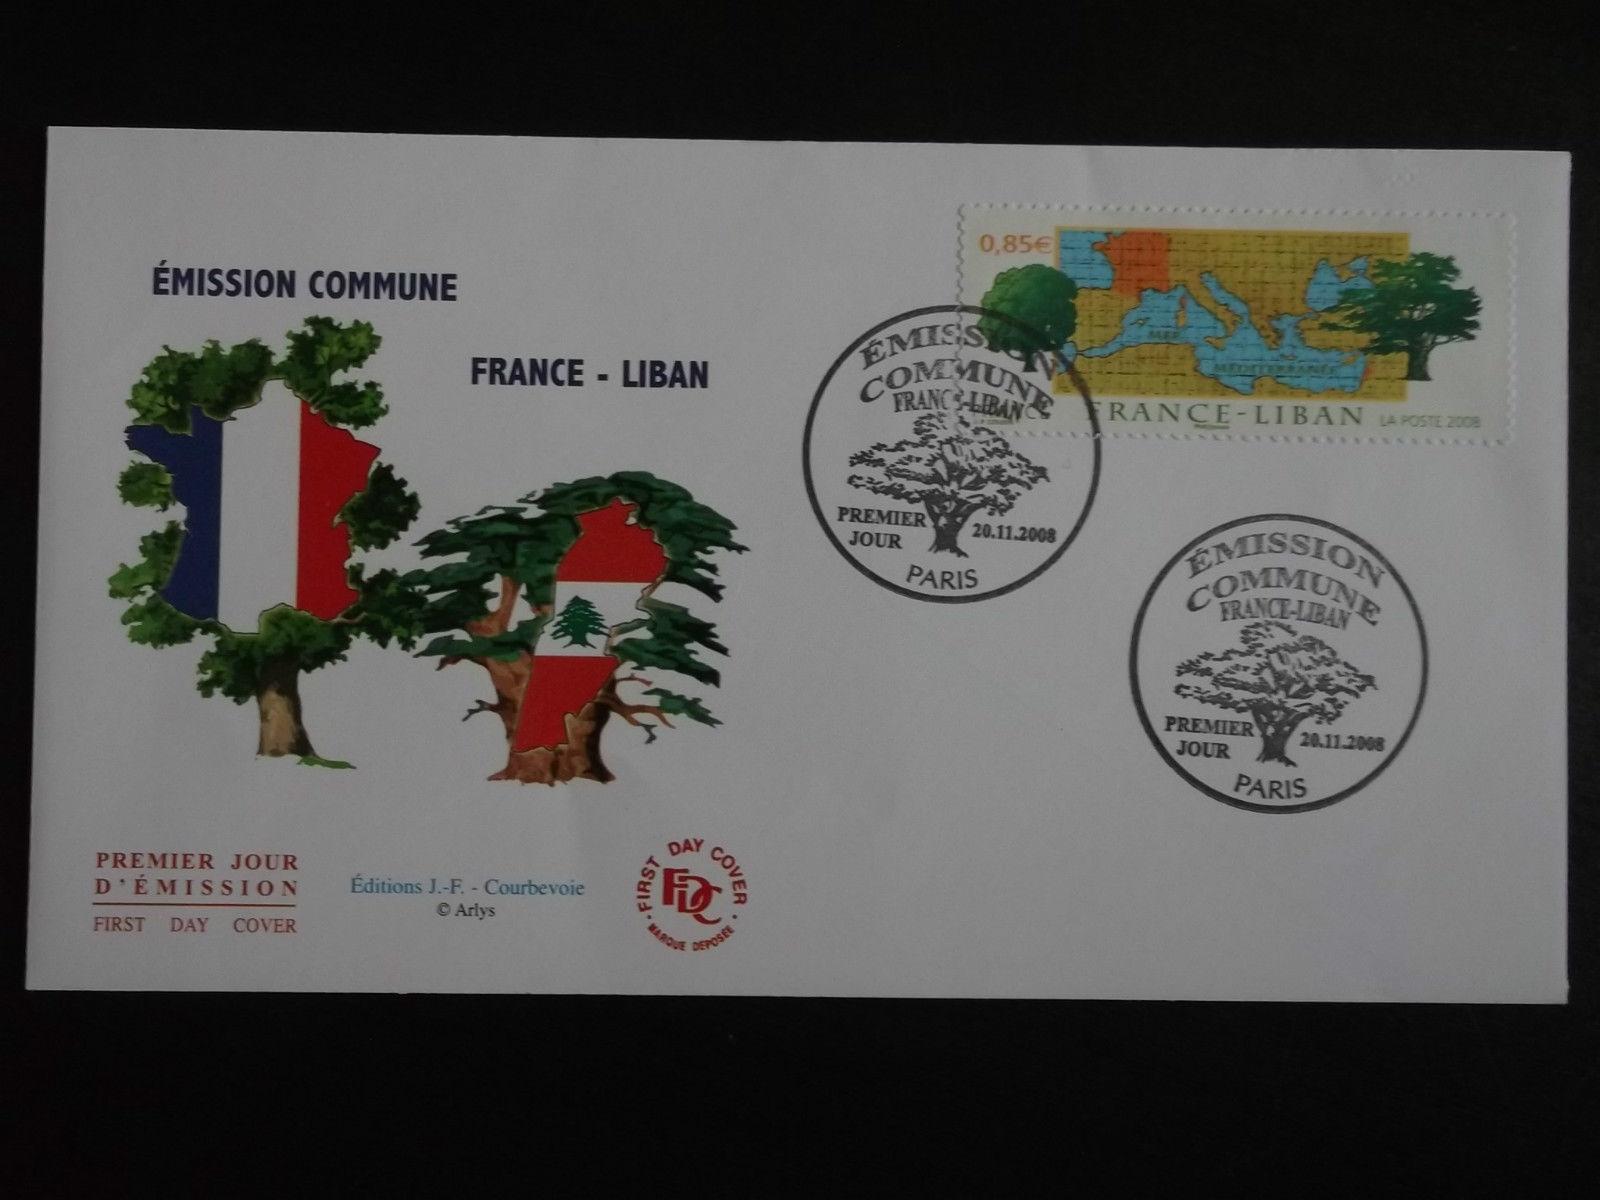 2008.11.20 FDC Enveloppe Premier Jour Emission Commune France-Liban 201085380552